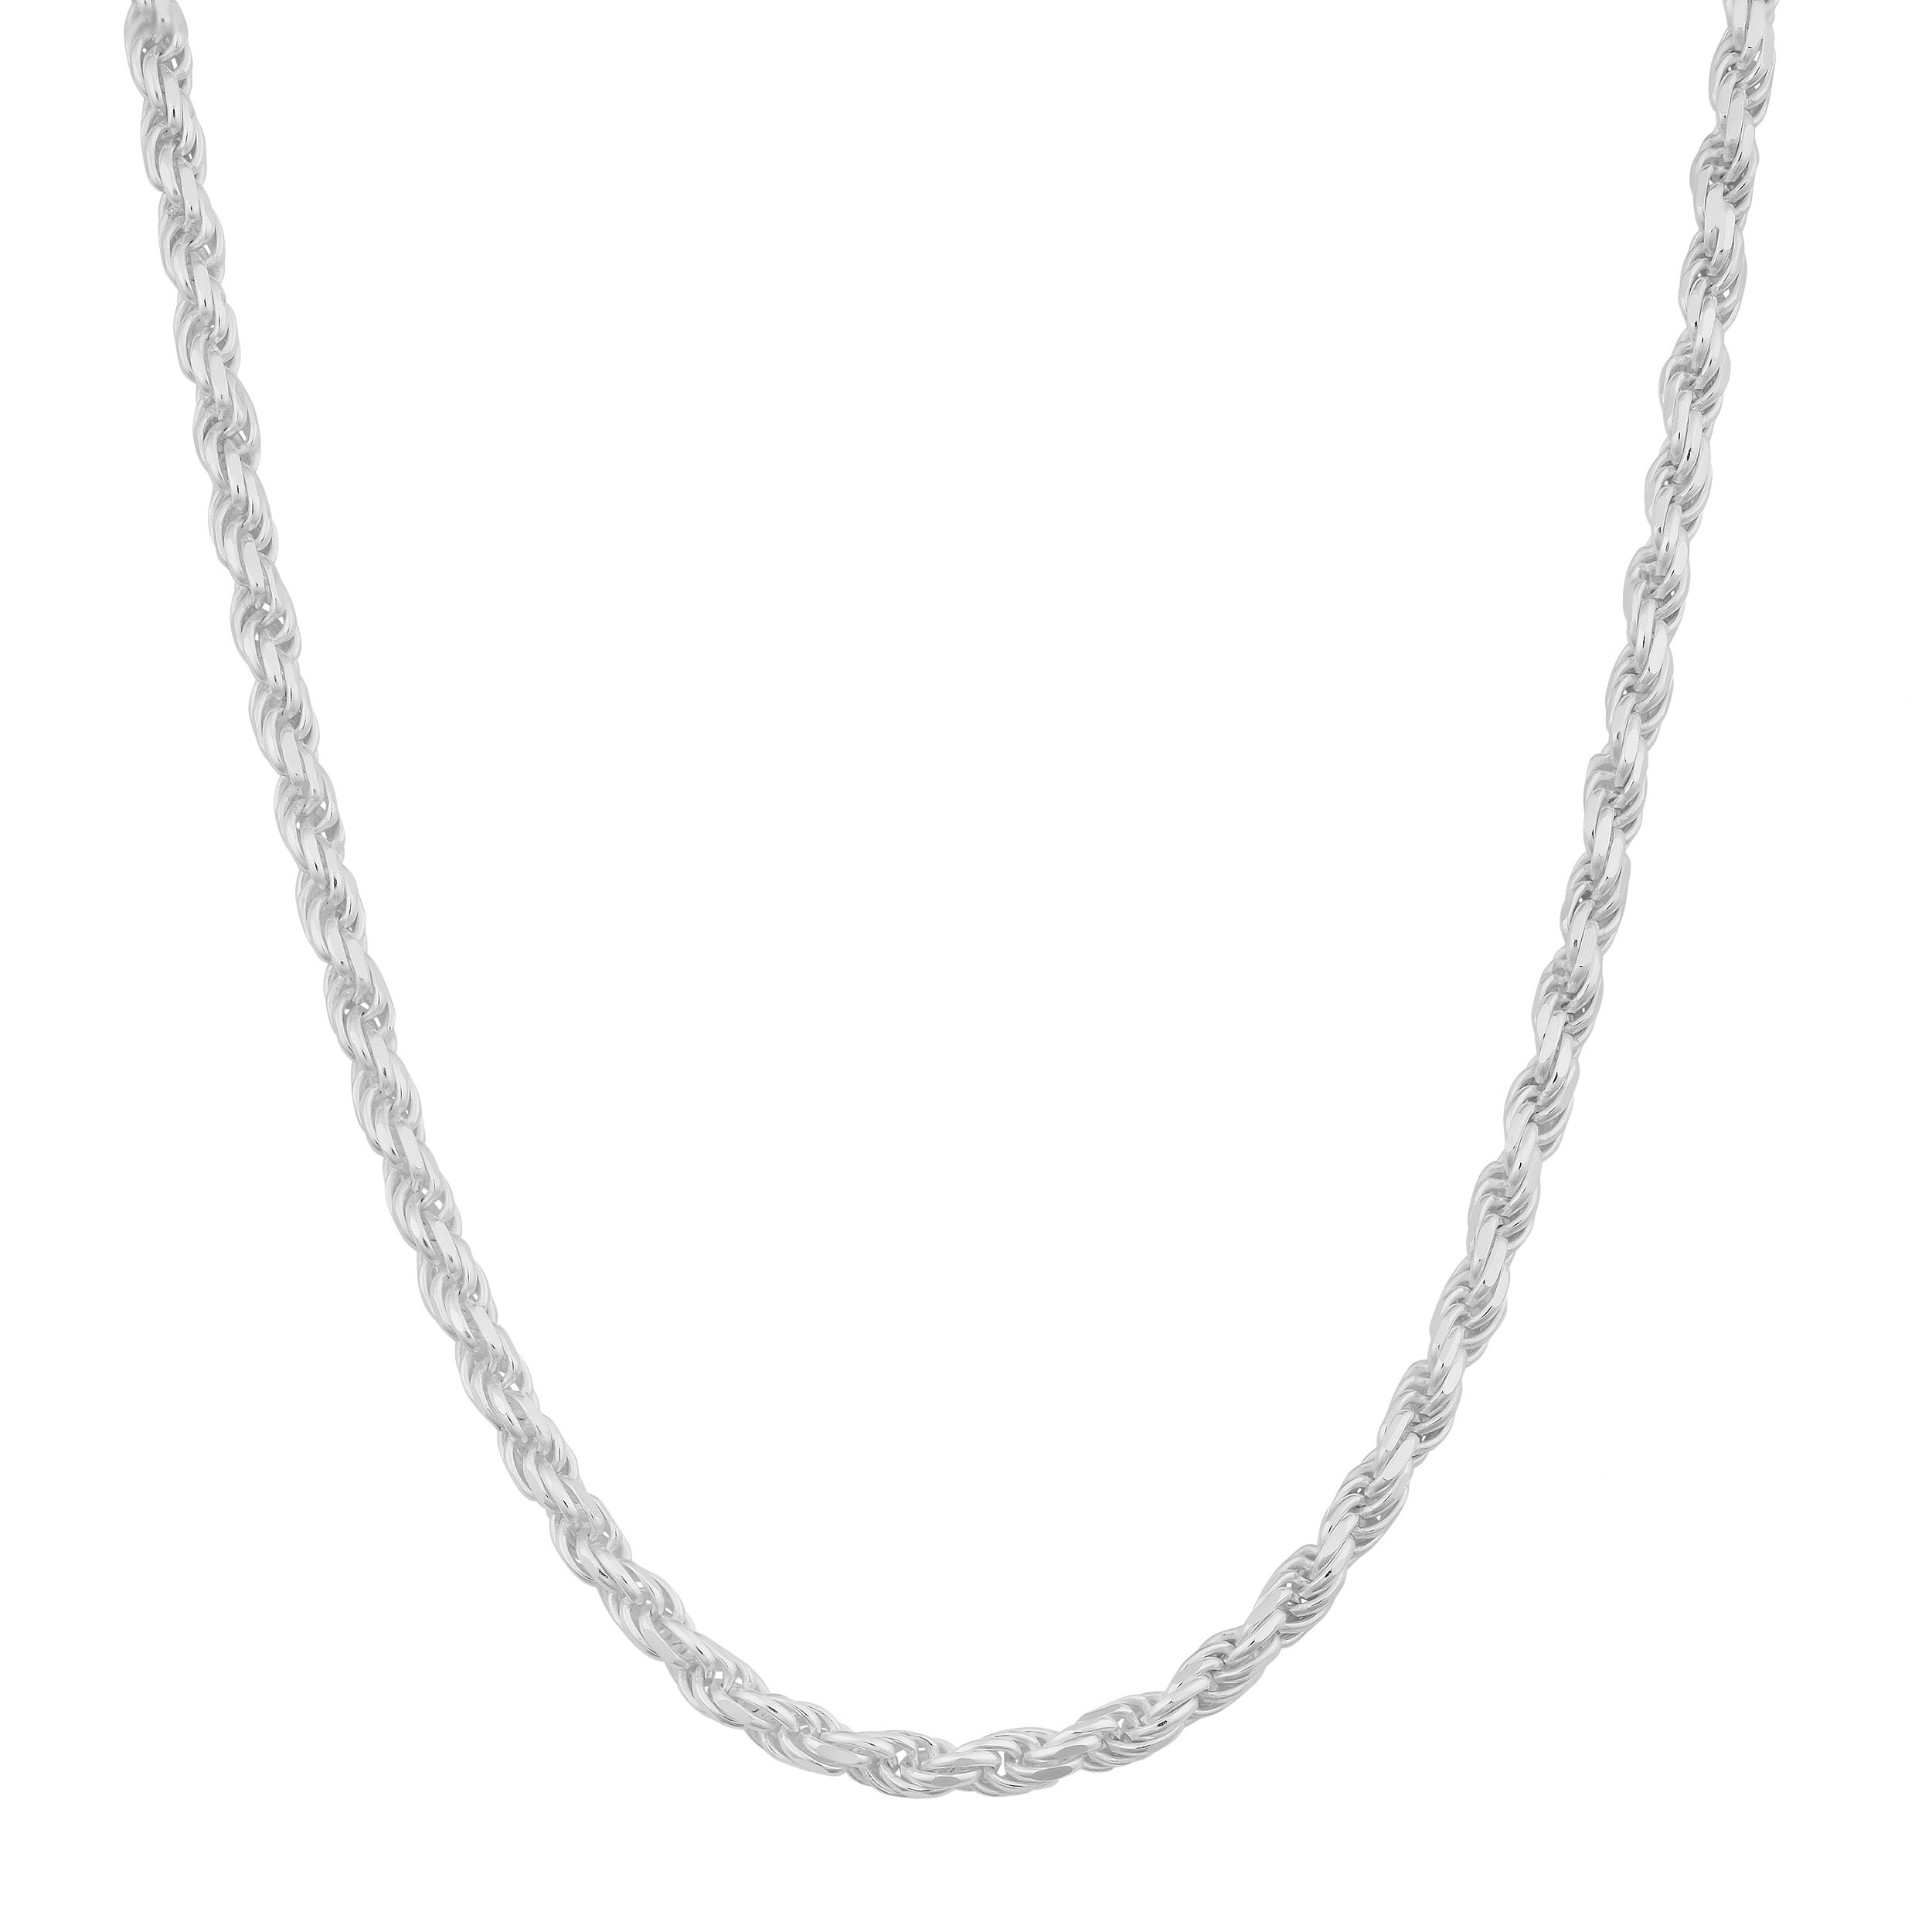 Kooljewelry Sterling Silver 1.9 mm Diamond-Cut Rope Chain Necklace (18, 20, 22, 24, 30, or 36 inch)